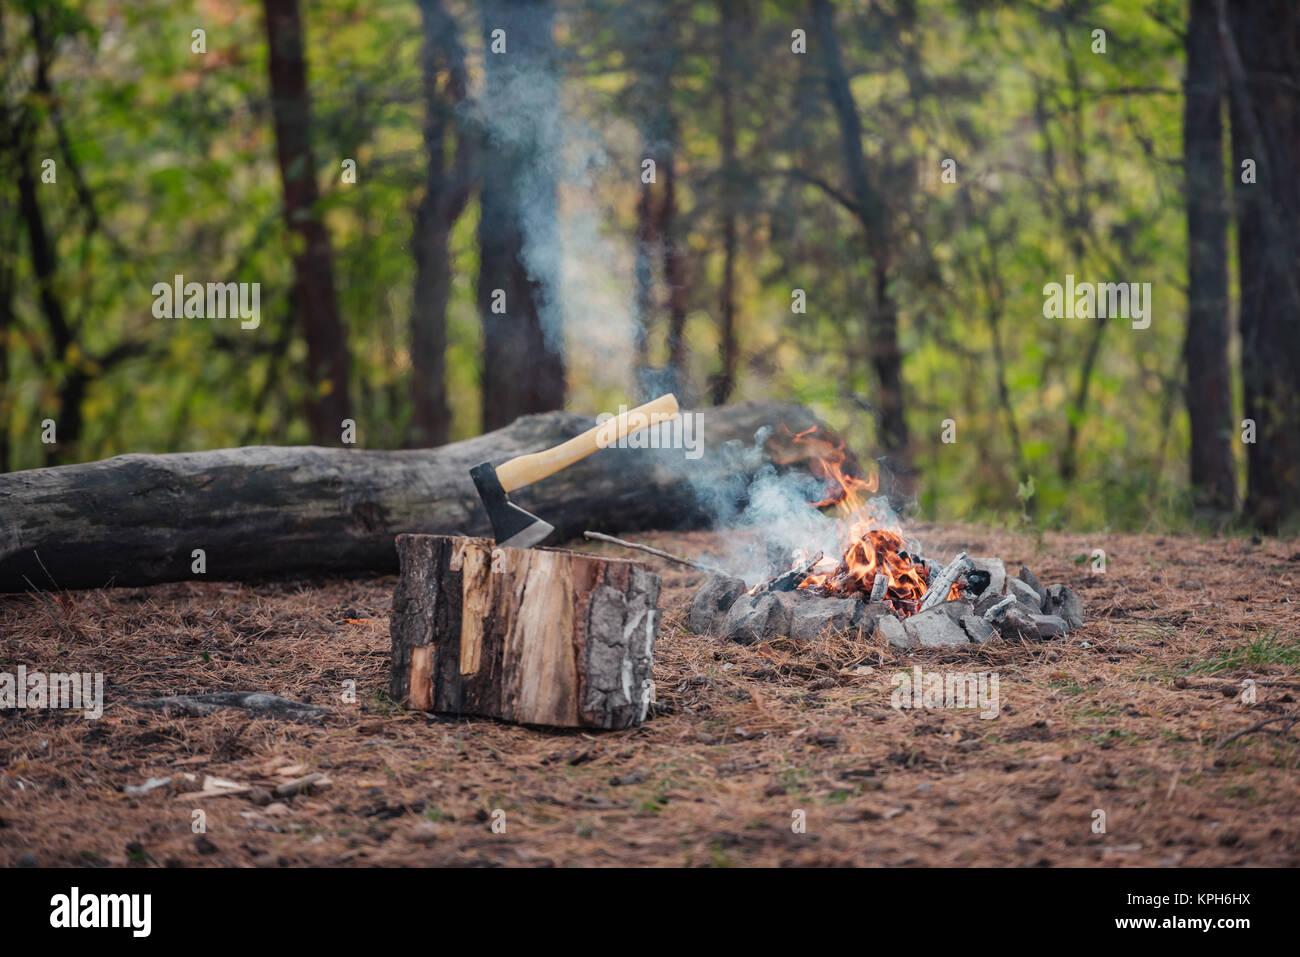 axe and bonfire  - Stock Image